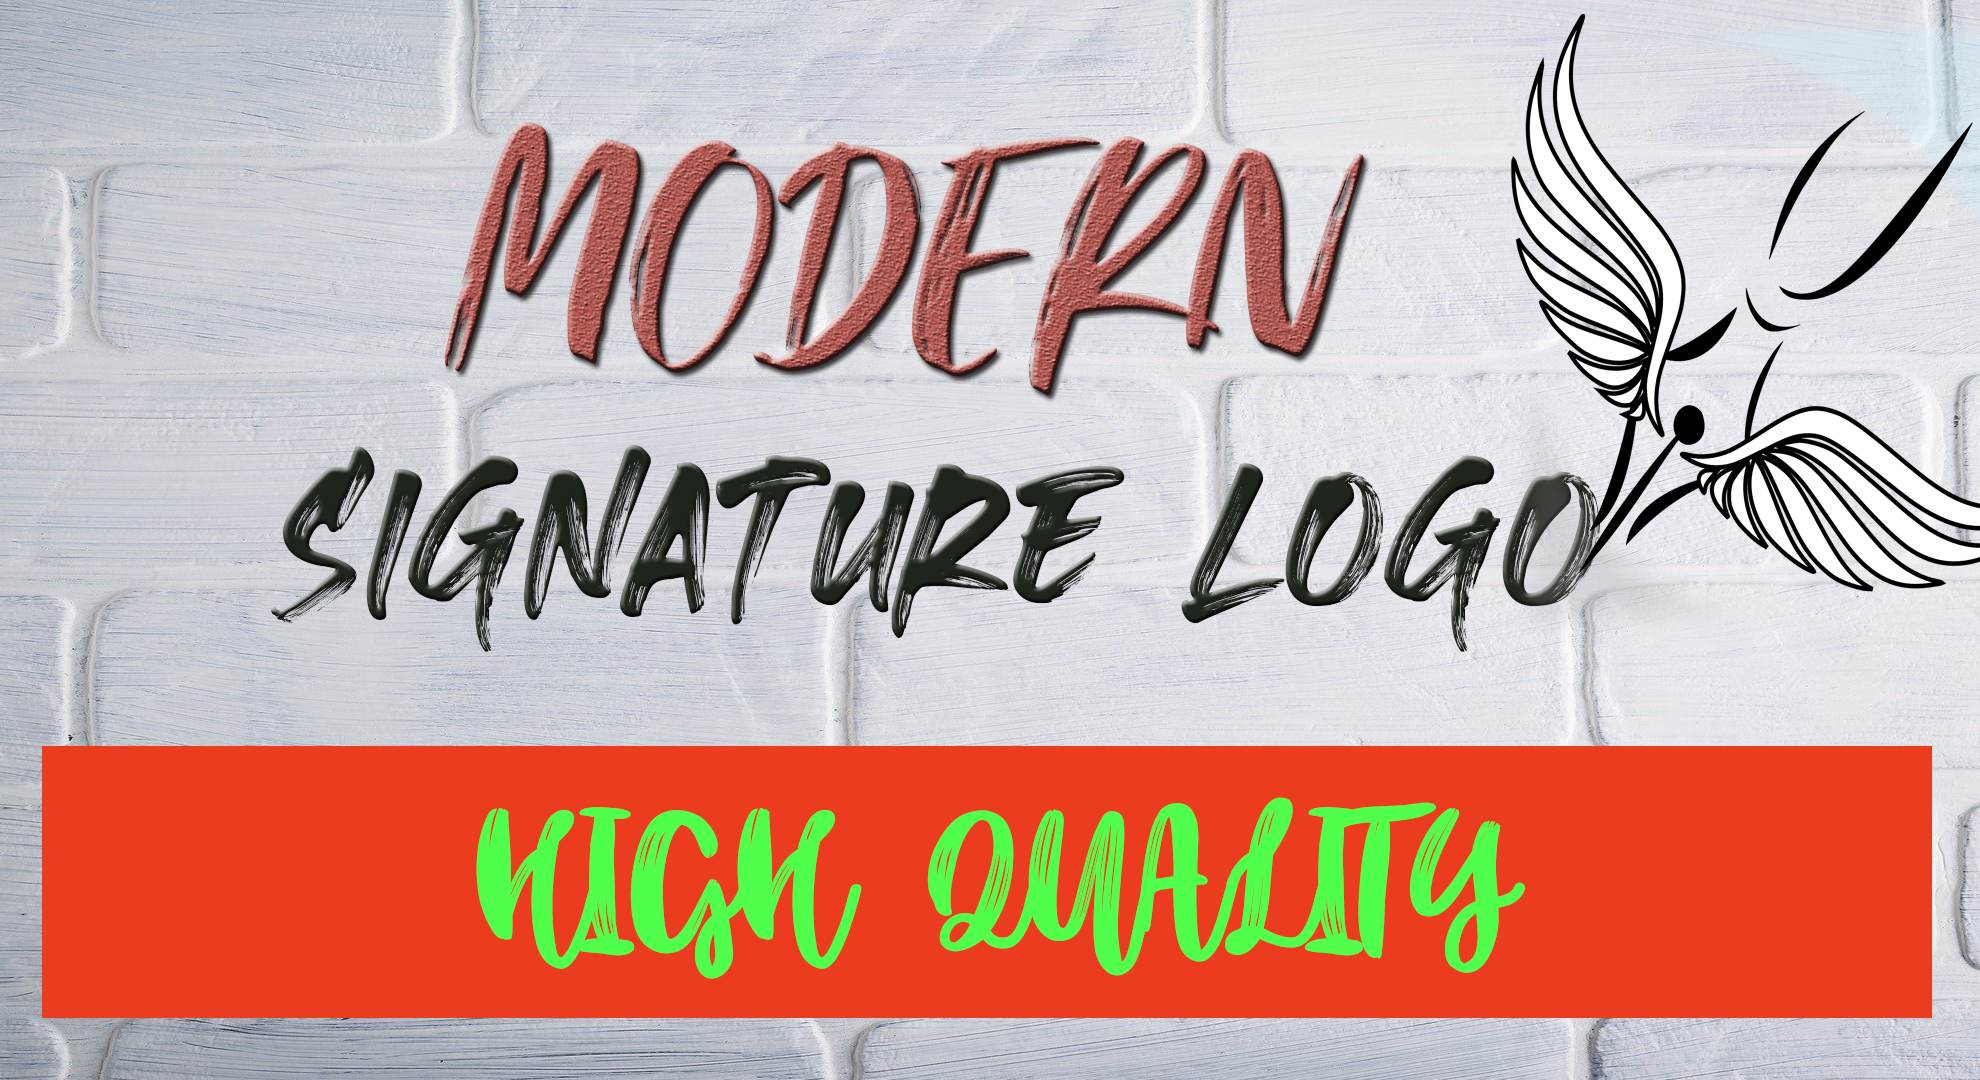 I will create a stunning modern signature logo